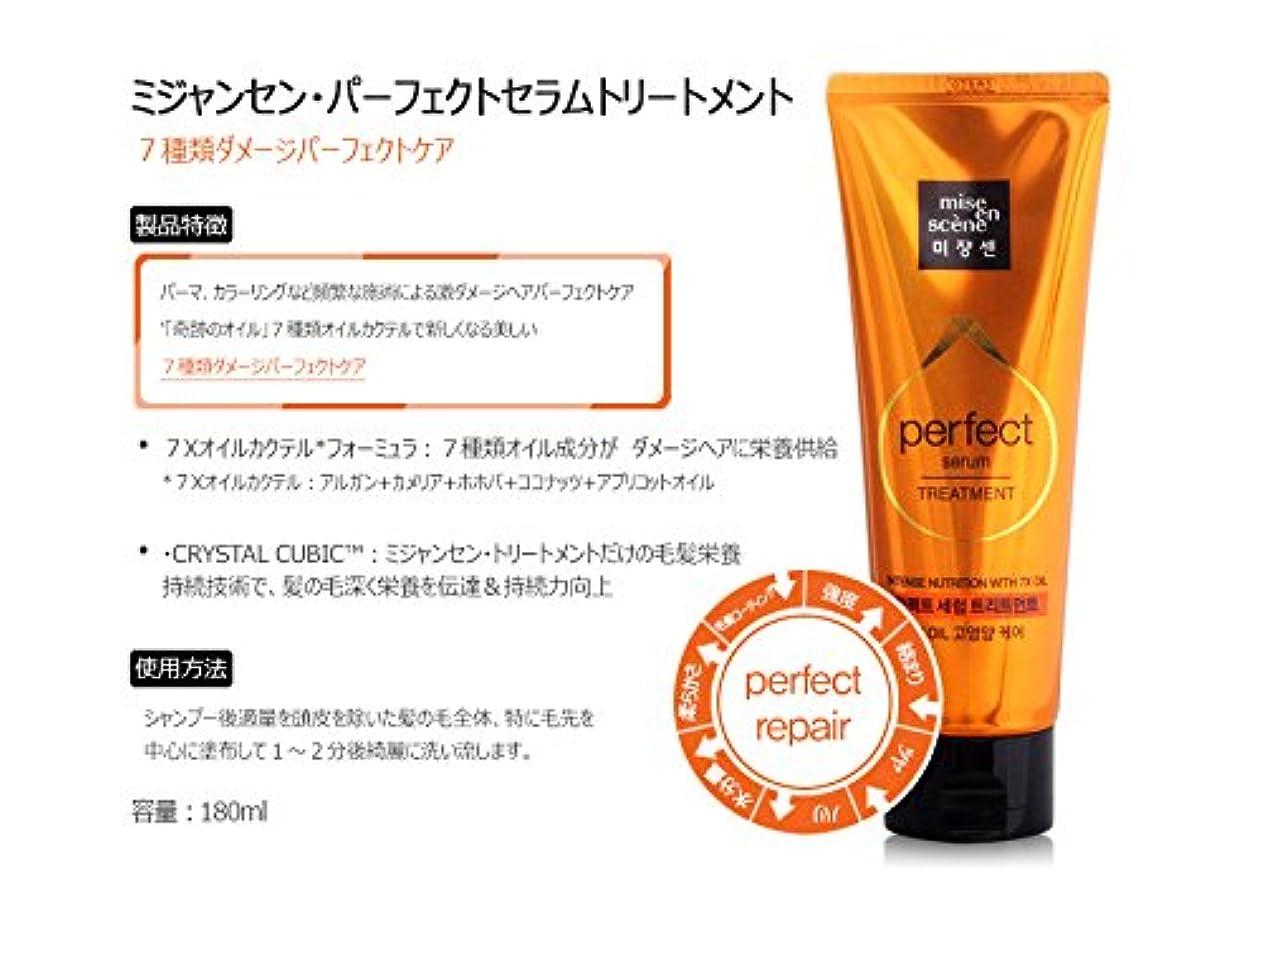 不適切な微視的酒[miseenscene]perfect serum treatment 180ml